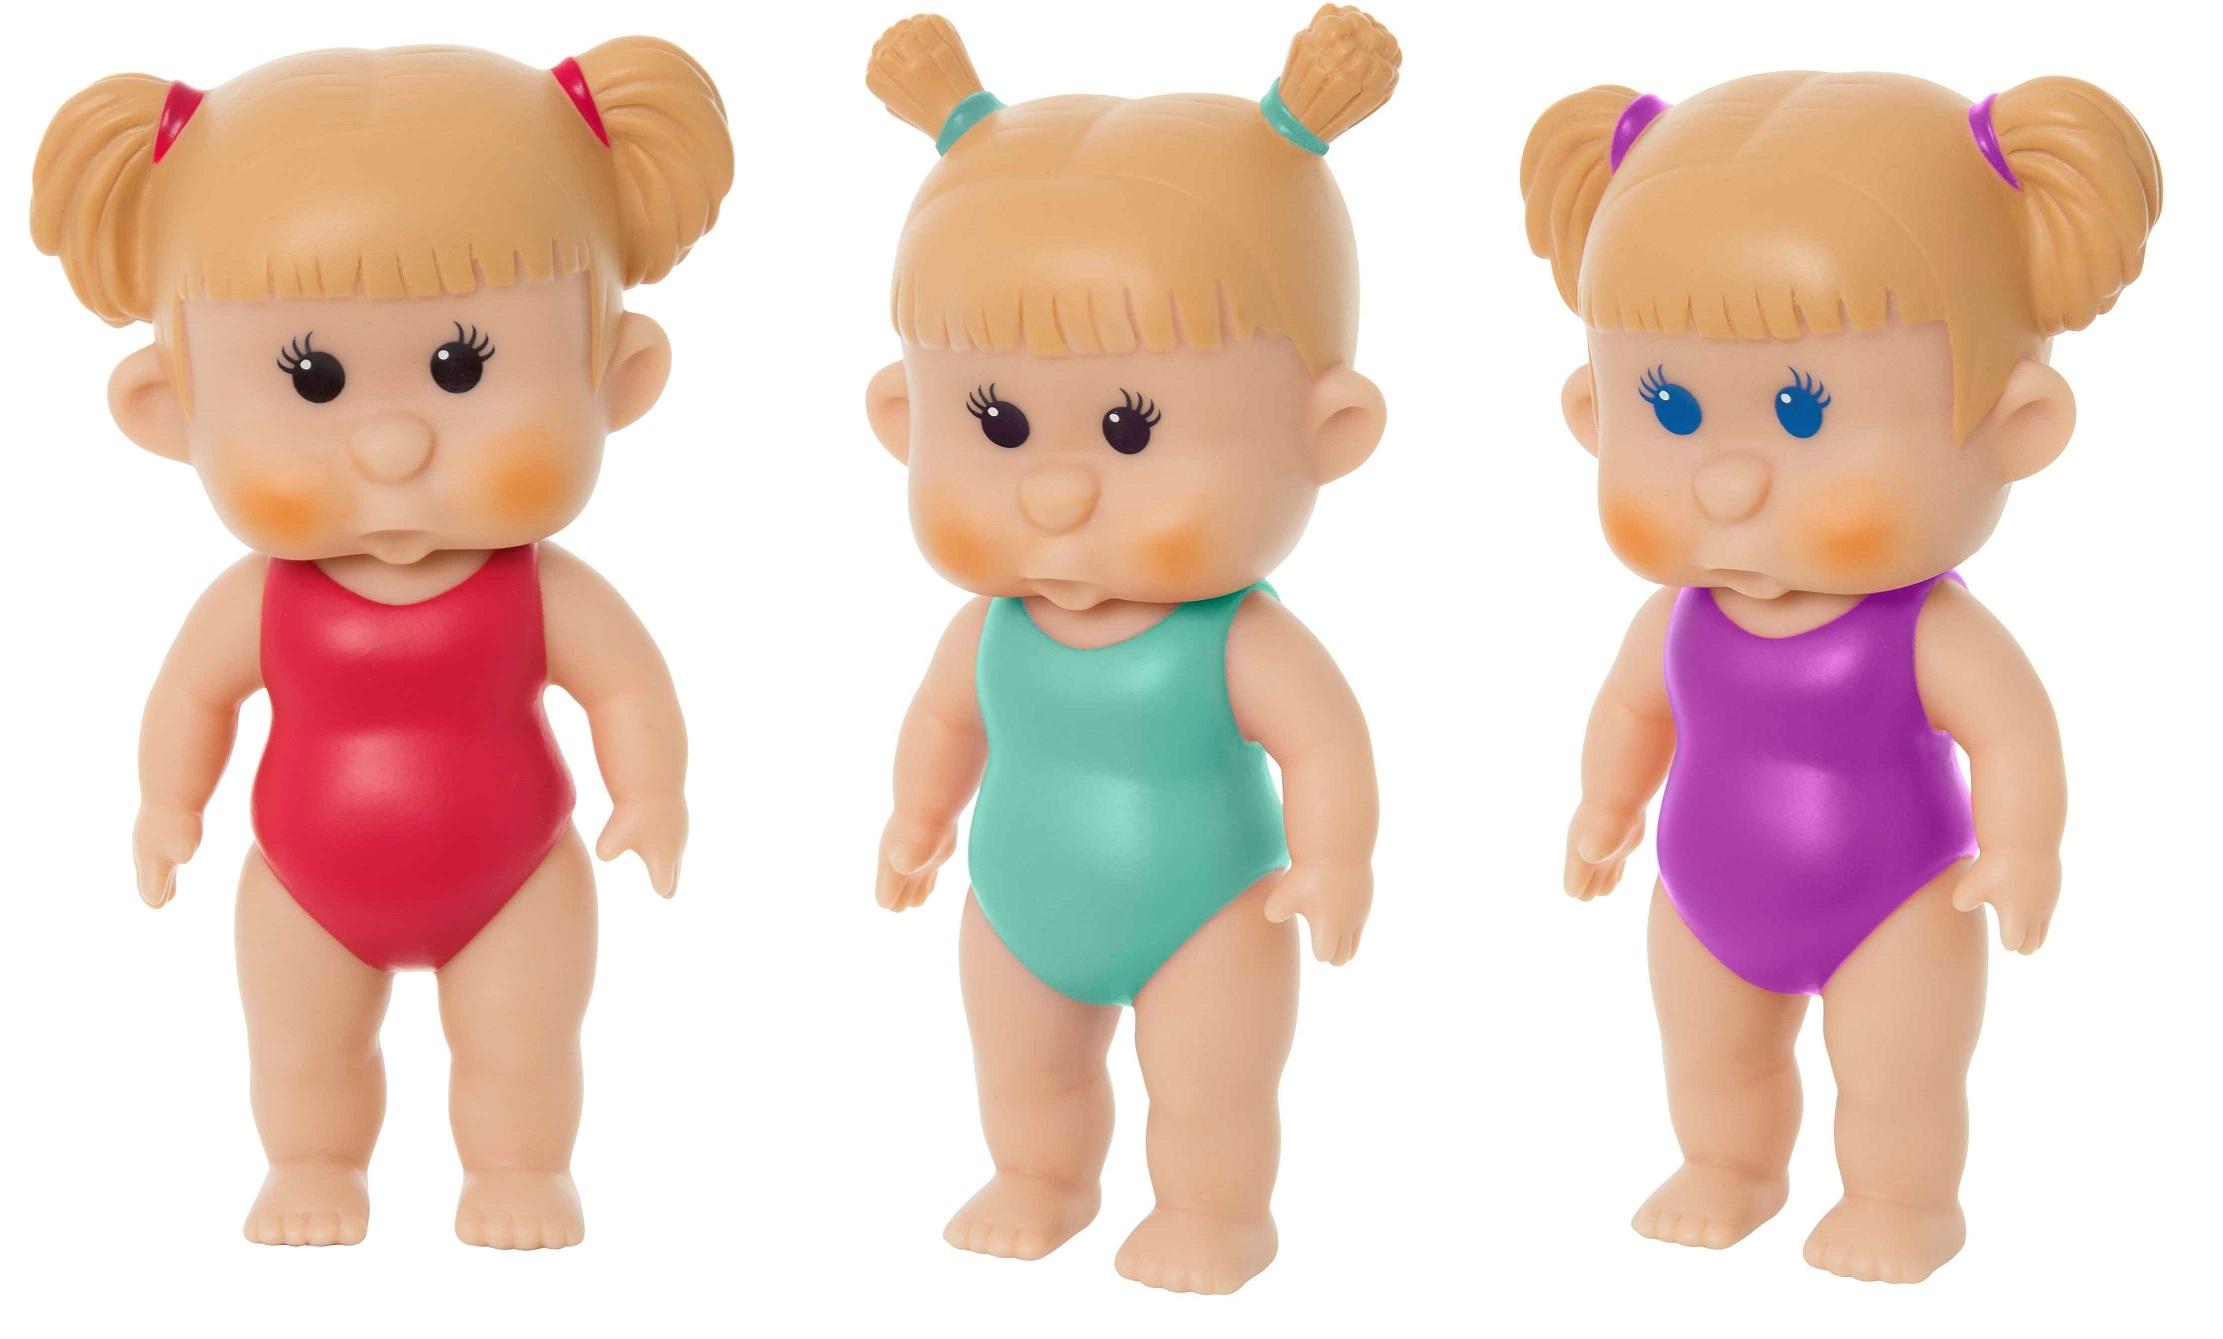 Игрушка для ванны Курносики Куколка Аленка игрушки для ванны babymoov игрушка для купания кубики а104925